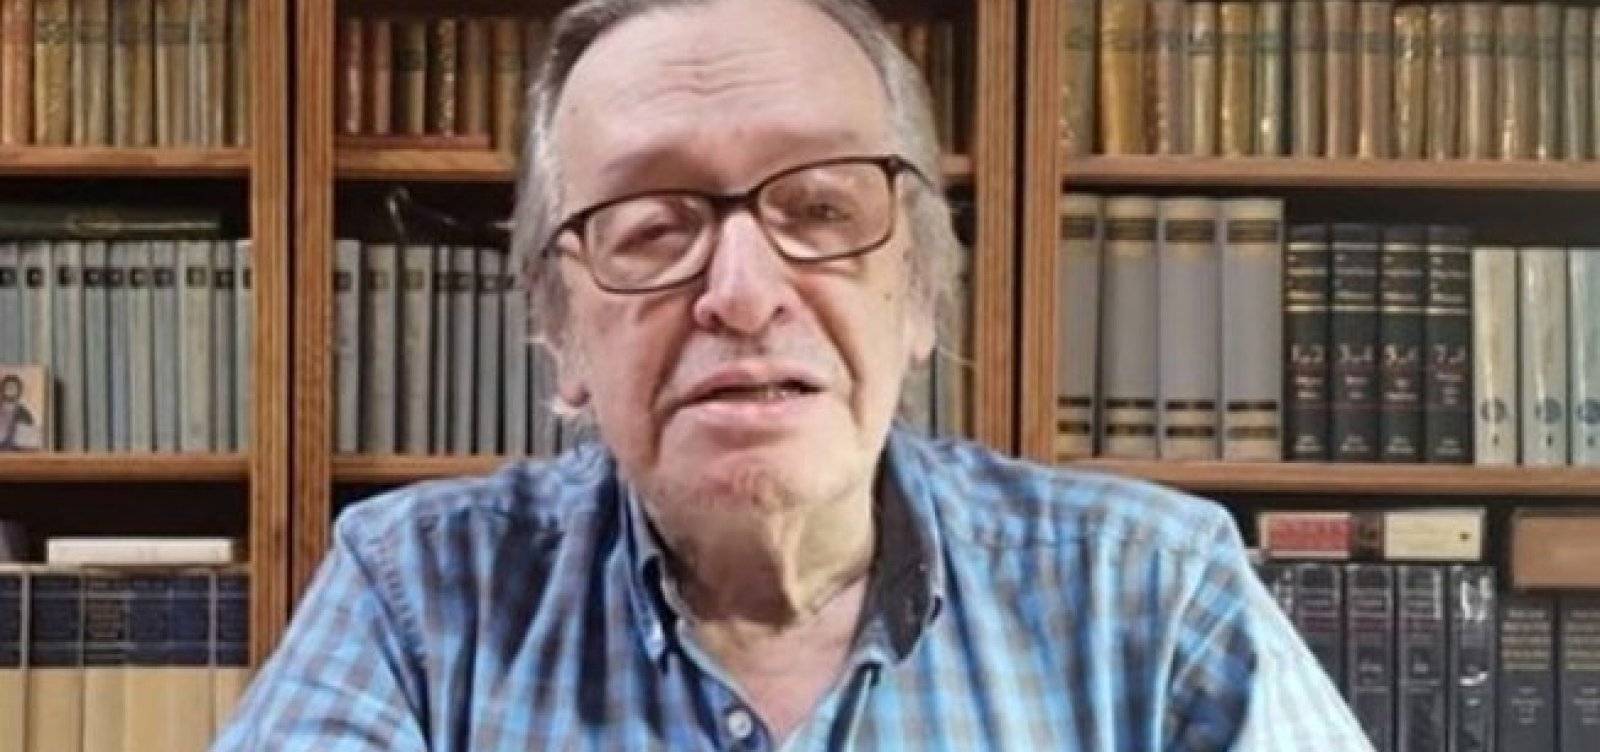 Olavo critica Vélez após Bolsonaro sinalizar demissão do ministro